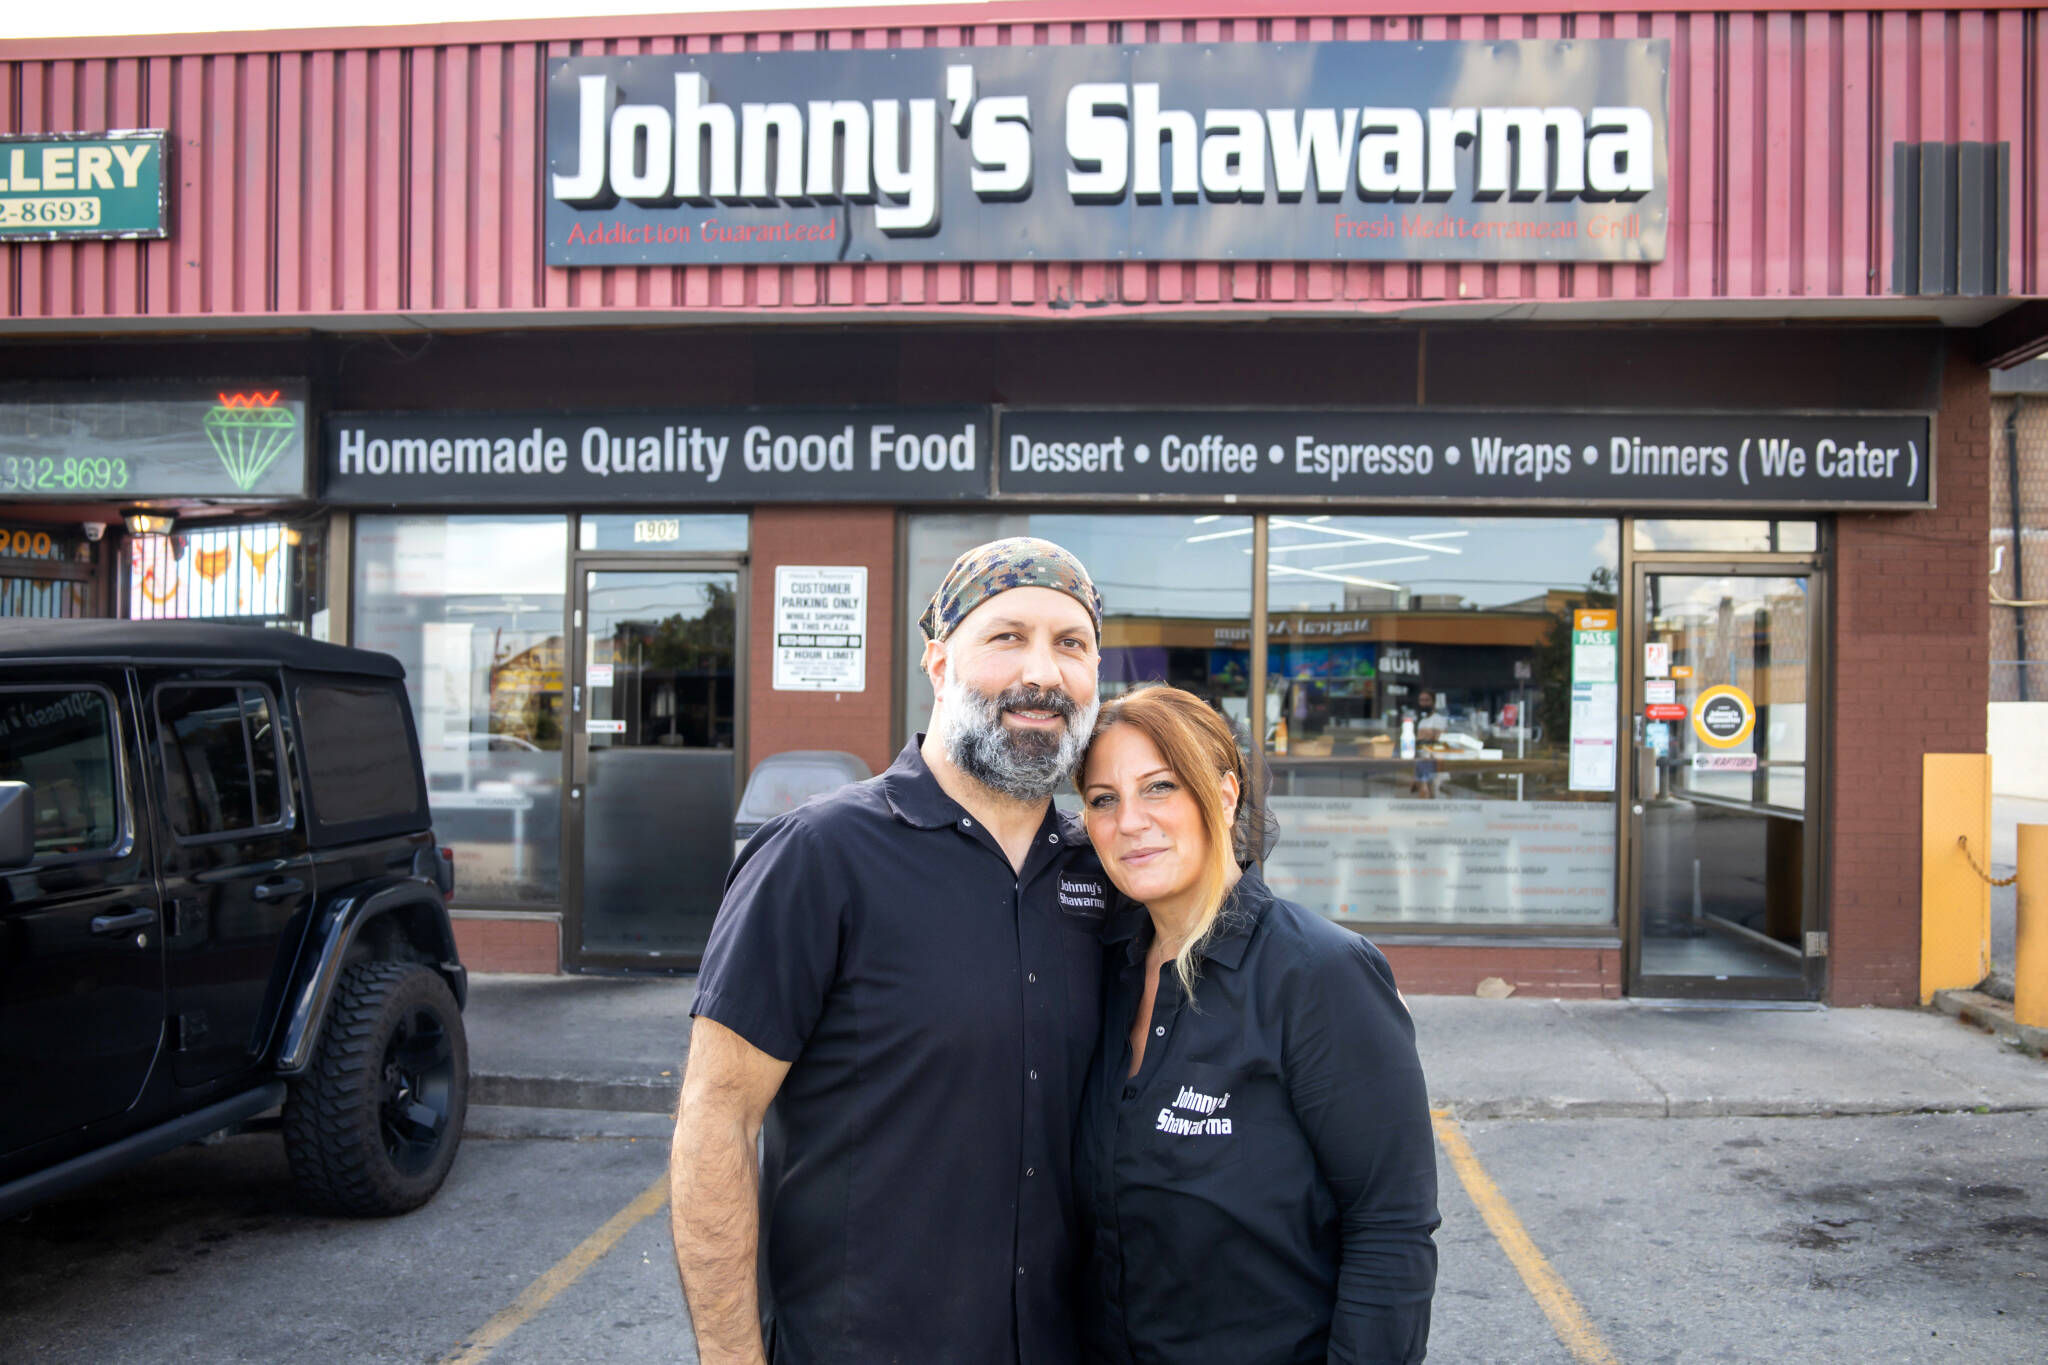 Johnnys Shawarma Toronto